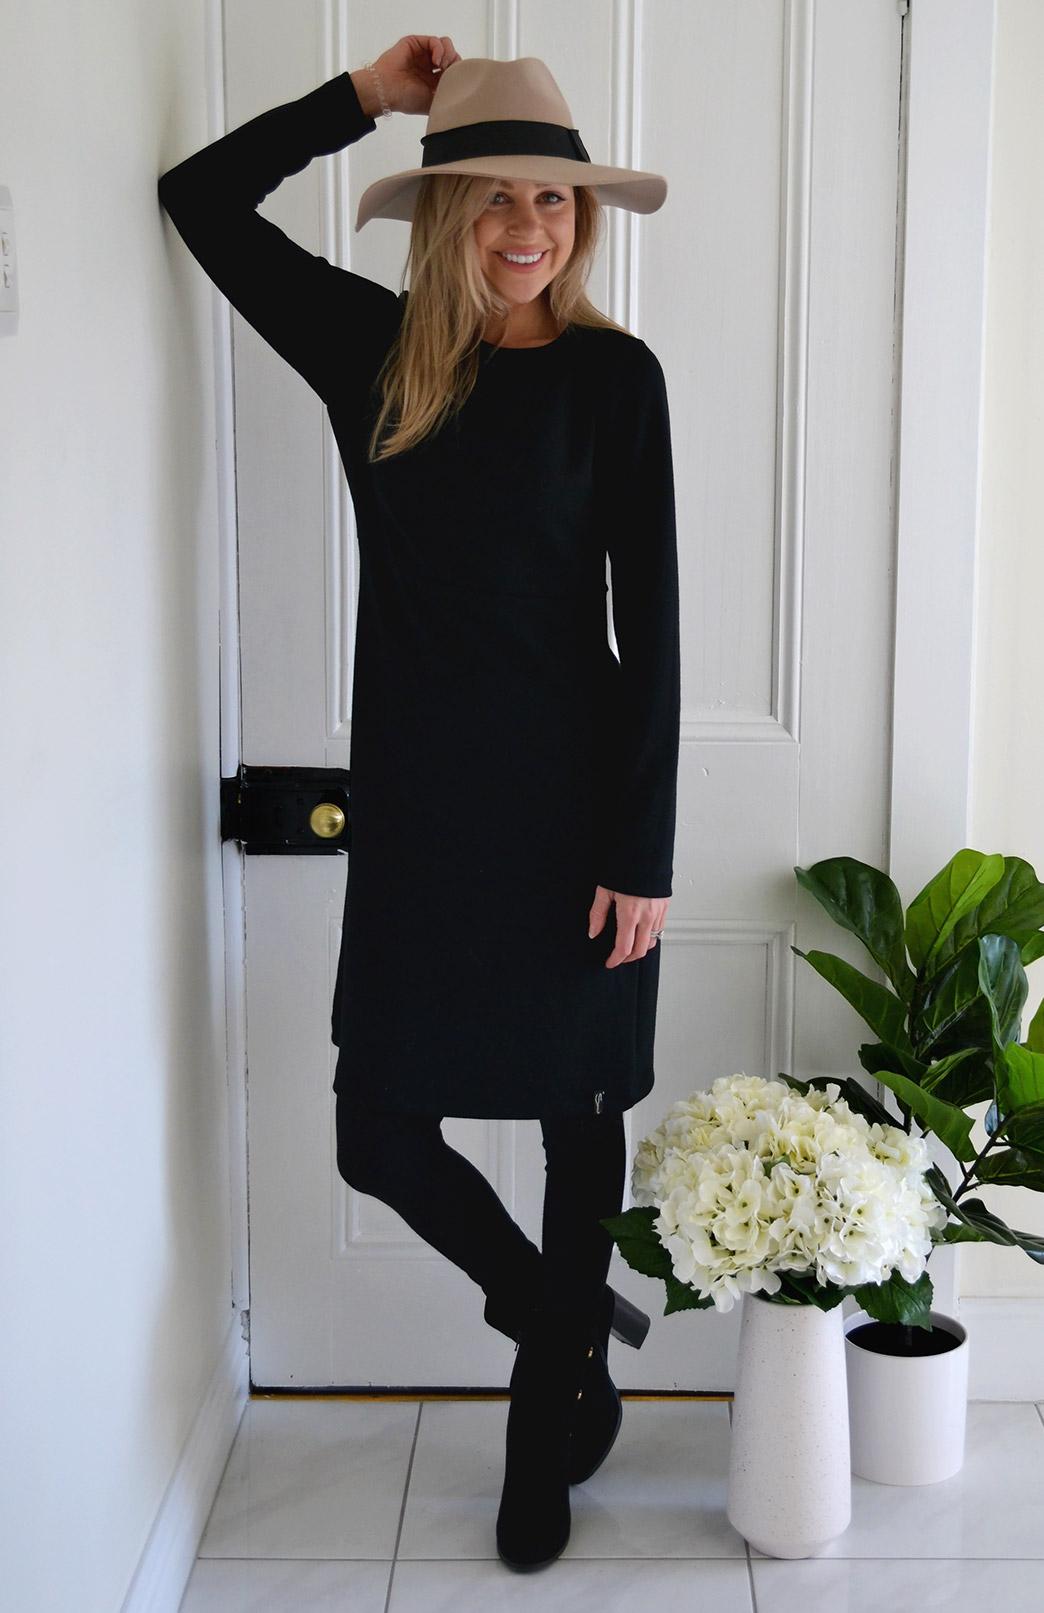 Sascha Straight Dress - Women's Superfine Merino Wool Black Long Sleeved Heavyweight Winter Dress - Smitten Merino Tasmania Australia